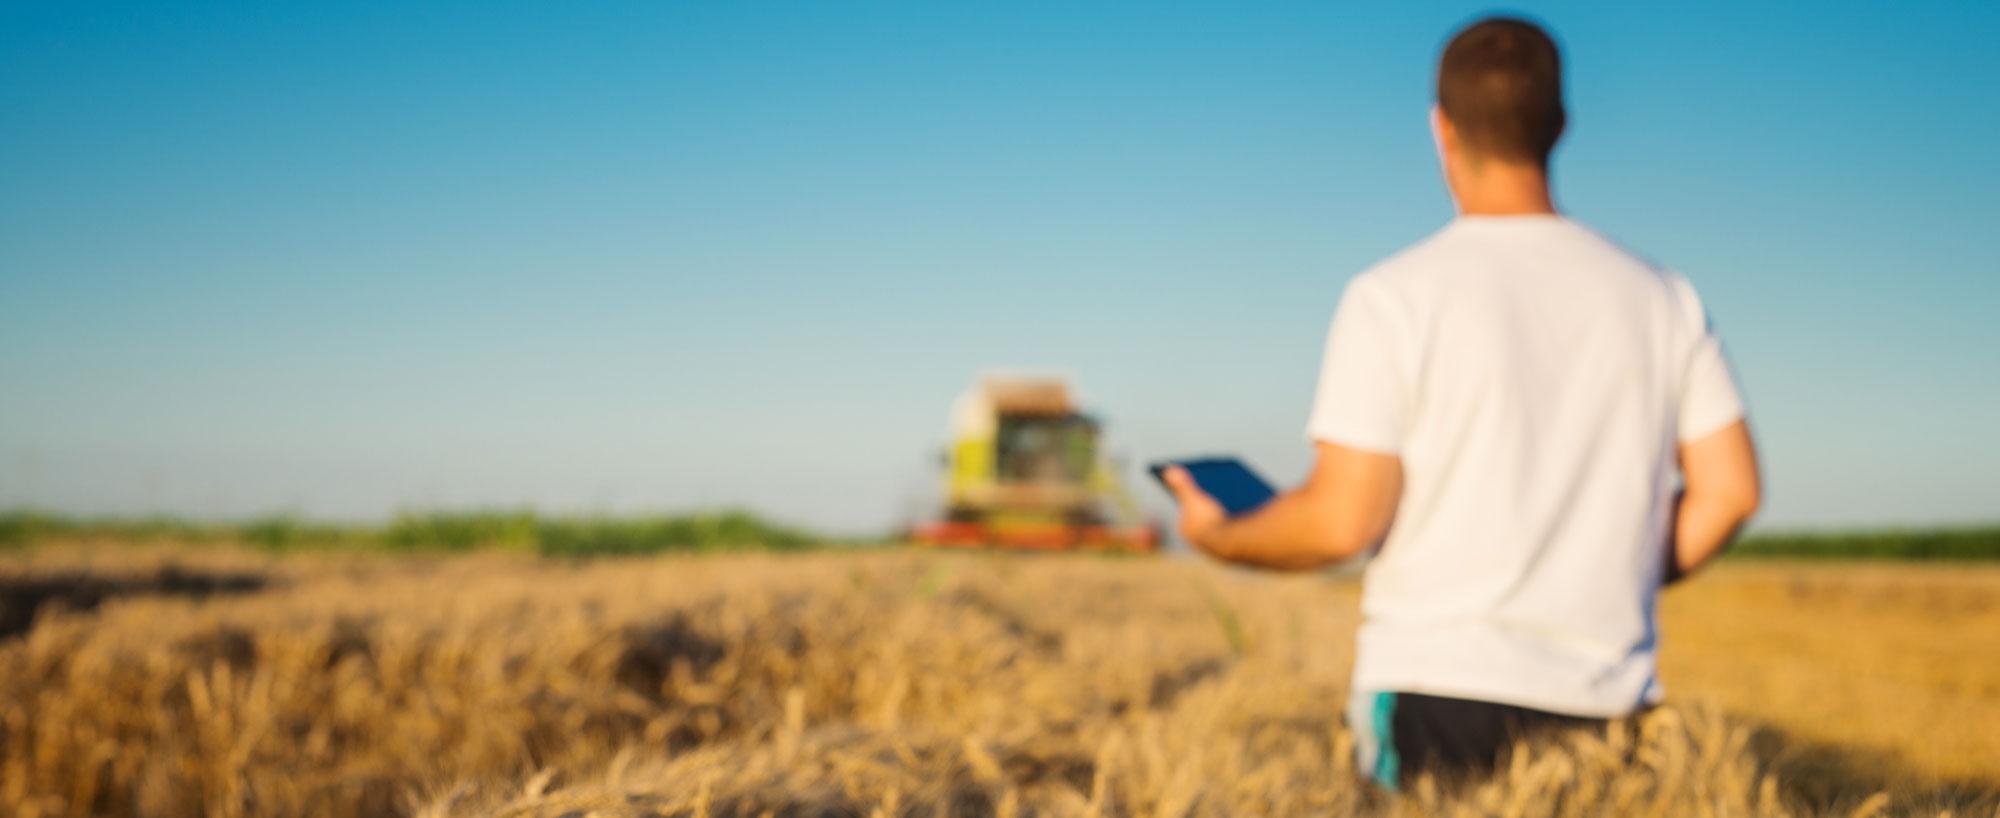 Skilliance Maroc - Machine Agricole